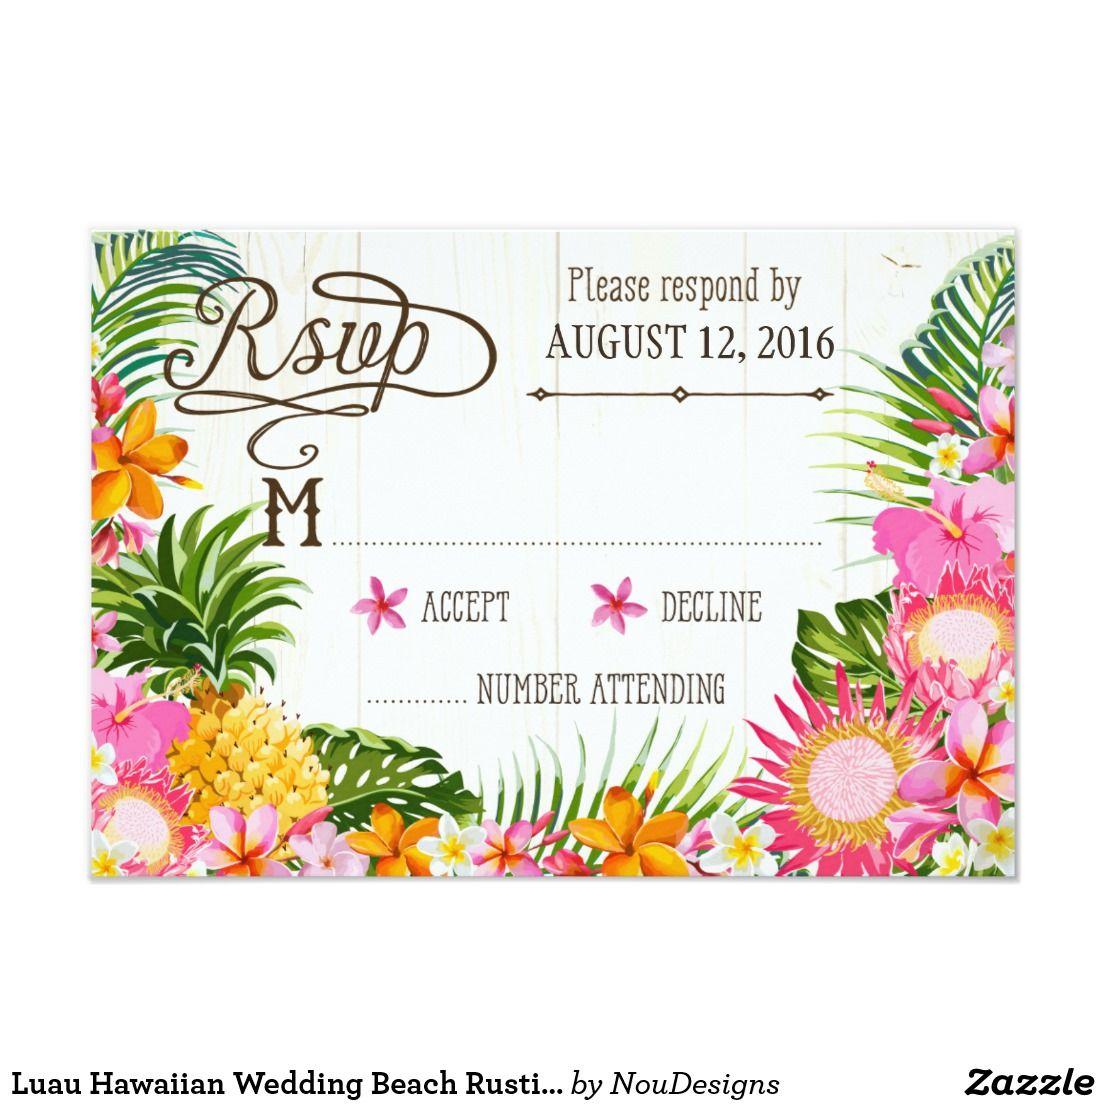 Luau Hawaiian Wedding Beach Rustic Beach RSVP Card | Beach Wedding ...